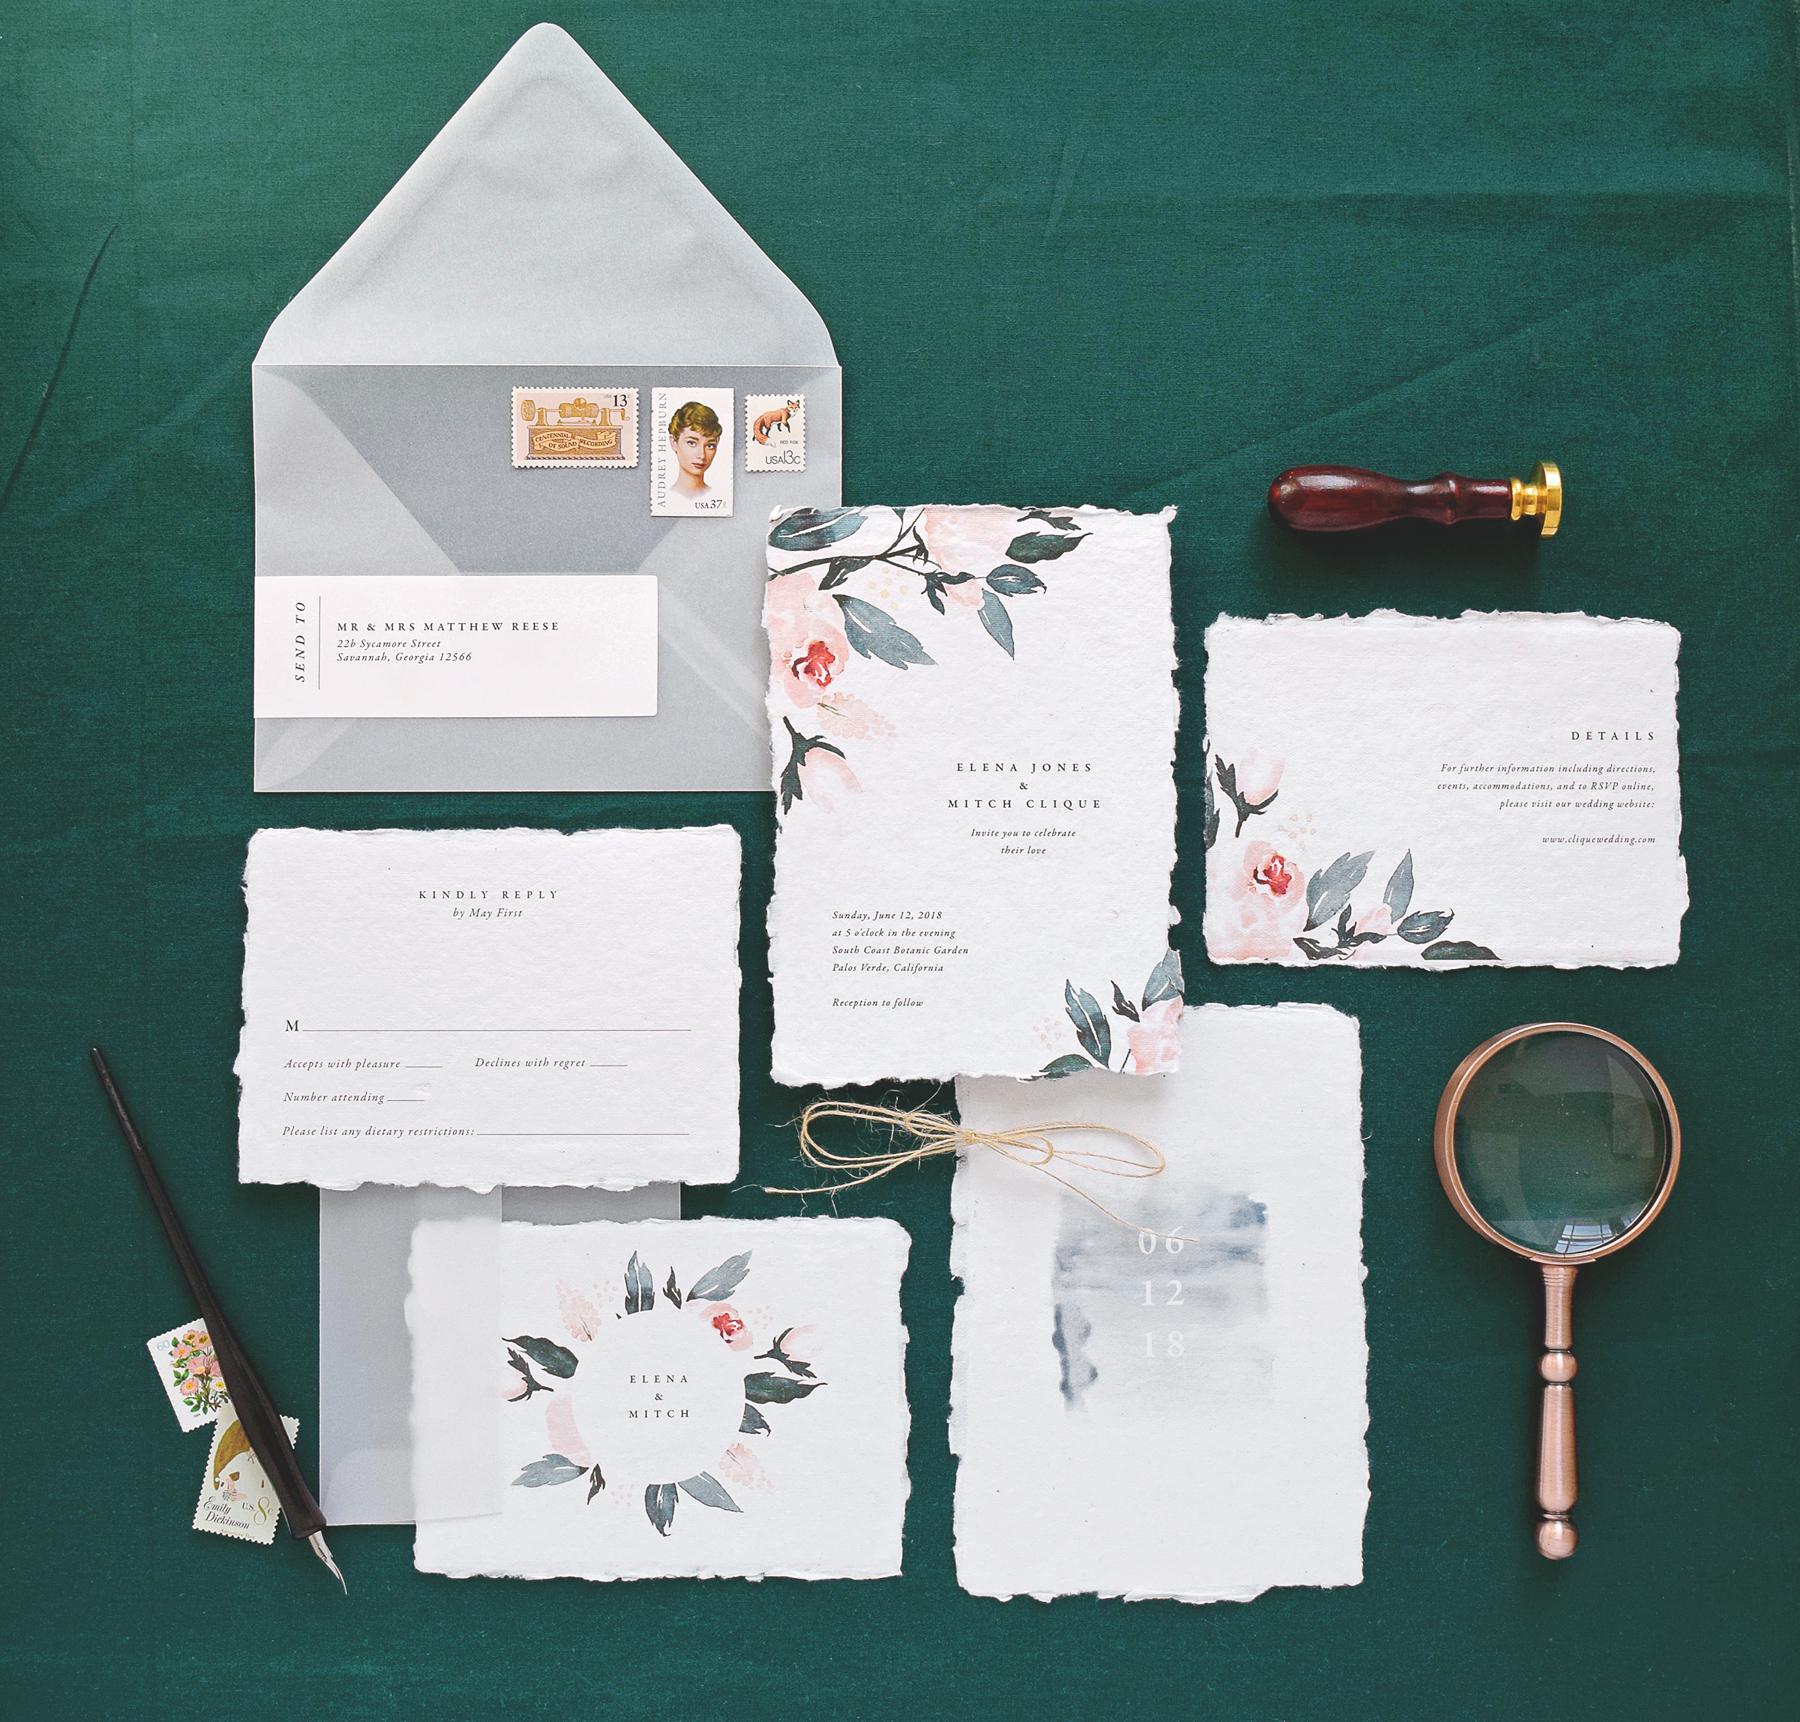 deckle edge invitations rachel martin creative